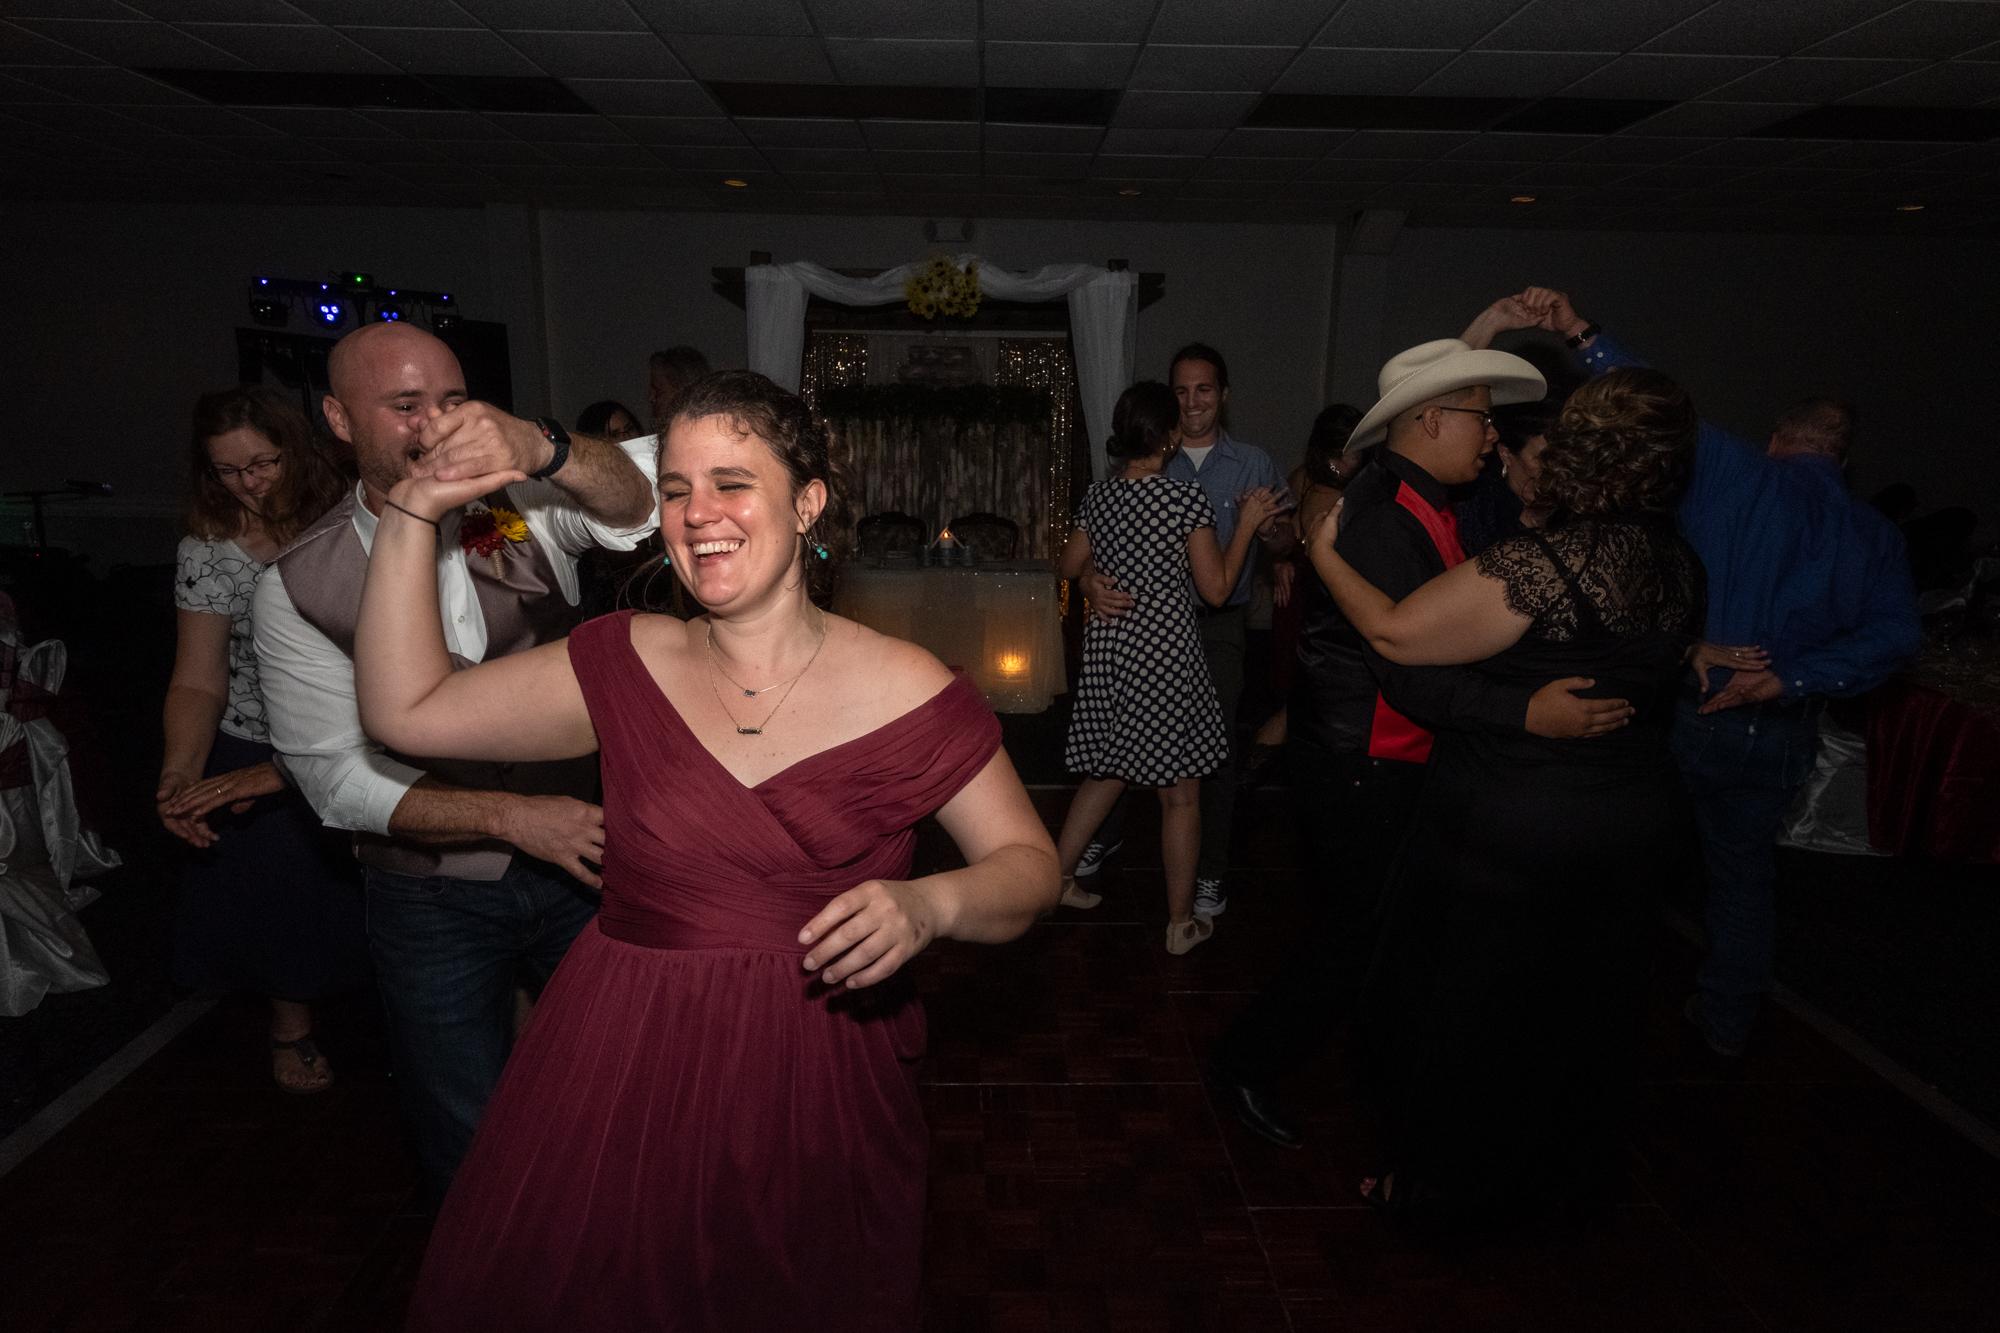 DallasAlyssa-Wedding-2019-JF-1464.jpg